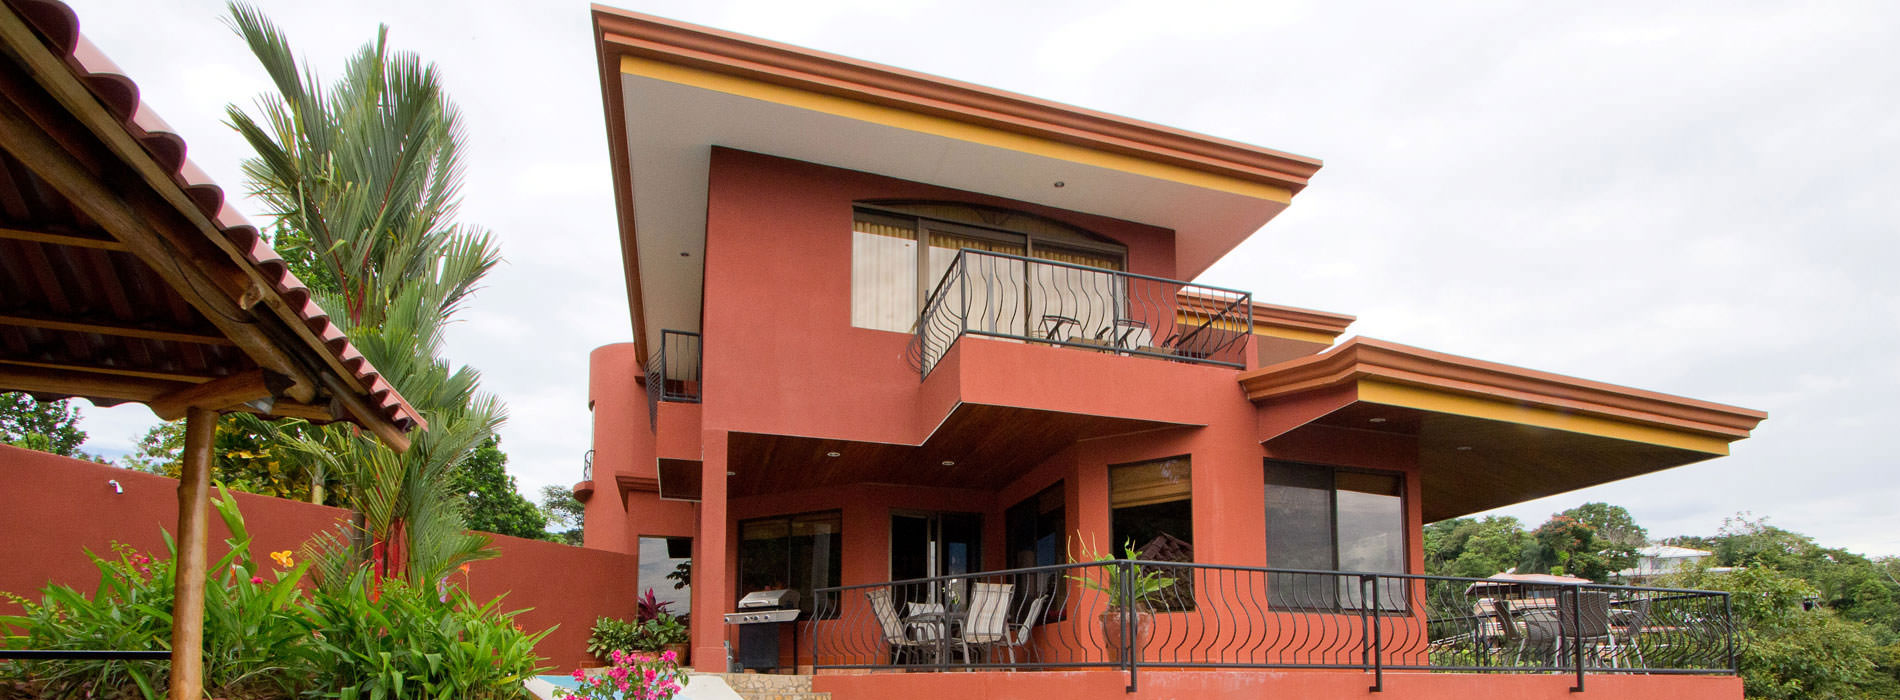 Villa mirador costa rica villa rentals costa rica vacations for Costa rica luxury rentals